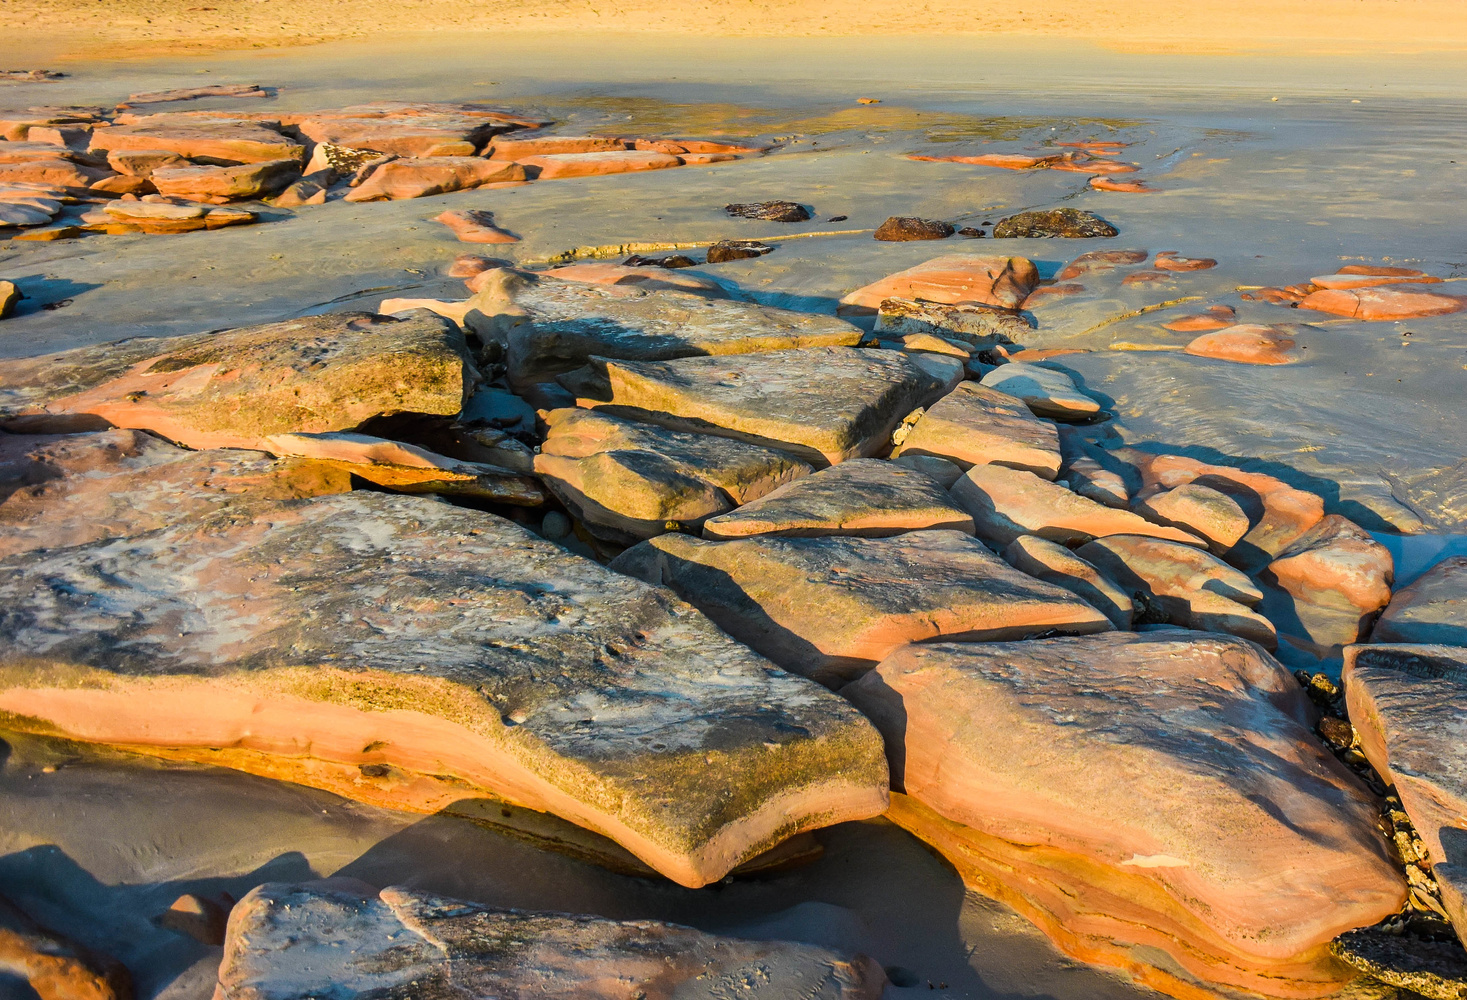 Broome rocks @ sunset - Australia by Marian Pollock